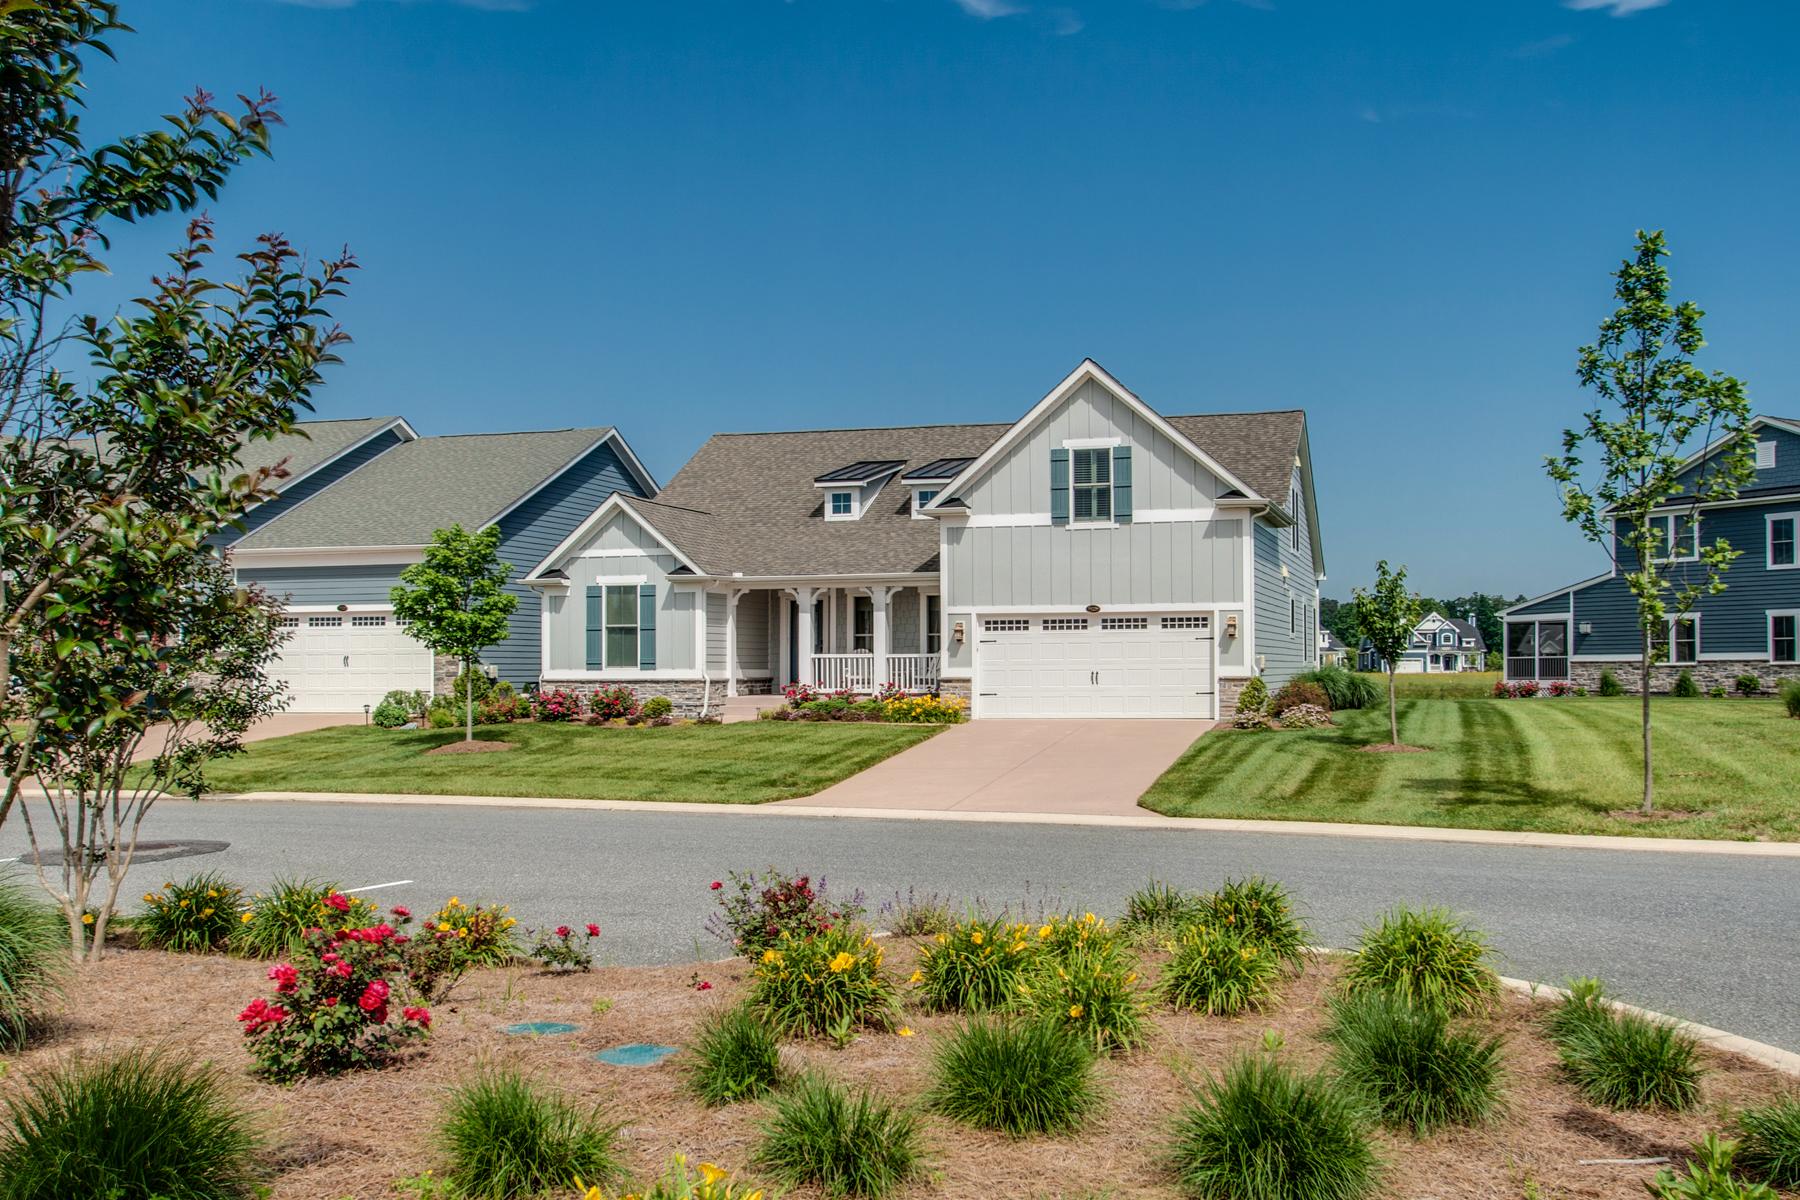 独户住宅 为 销售 在 33256 Wading Duck Drive , Millsboro, DE 19966 33256 Wading Duck Drive 米尔斯伯勒, 19966 美国